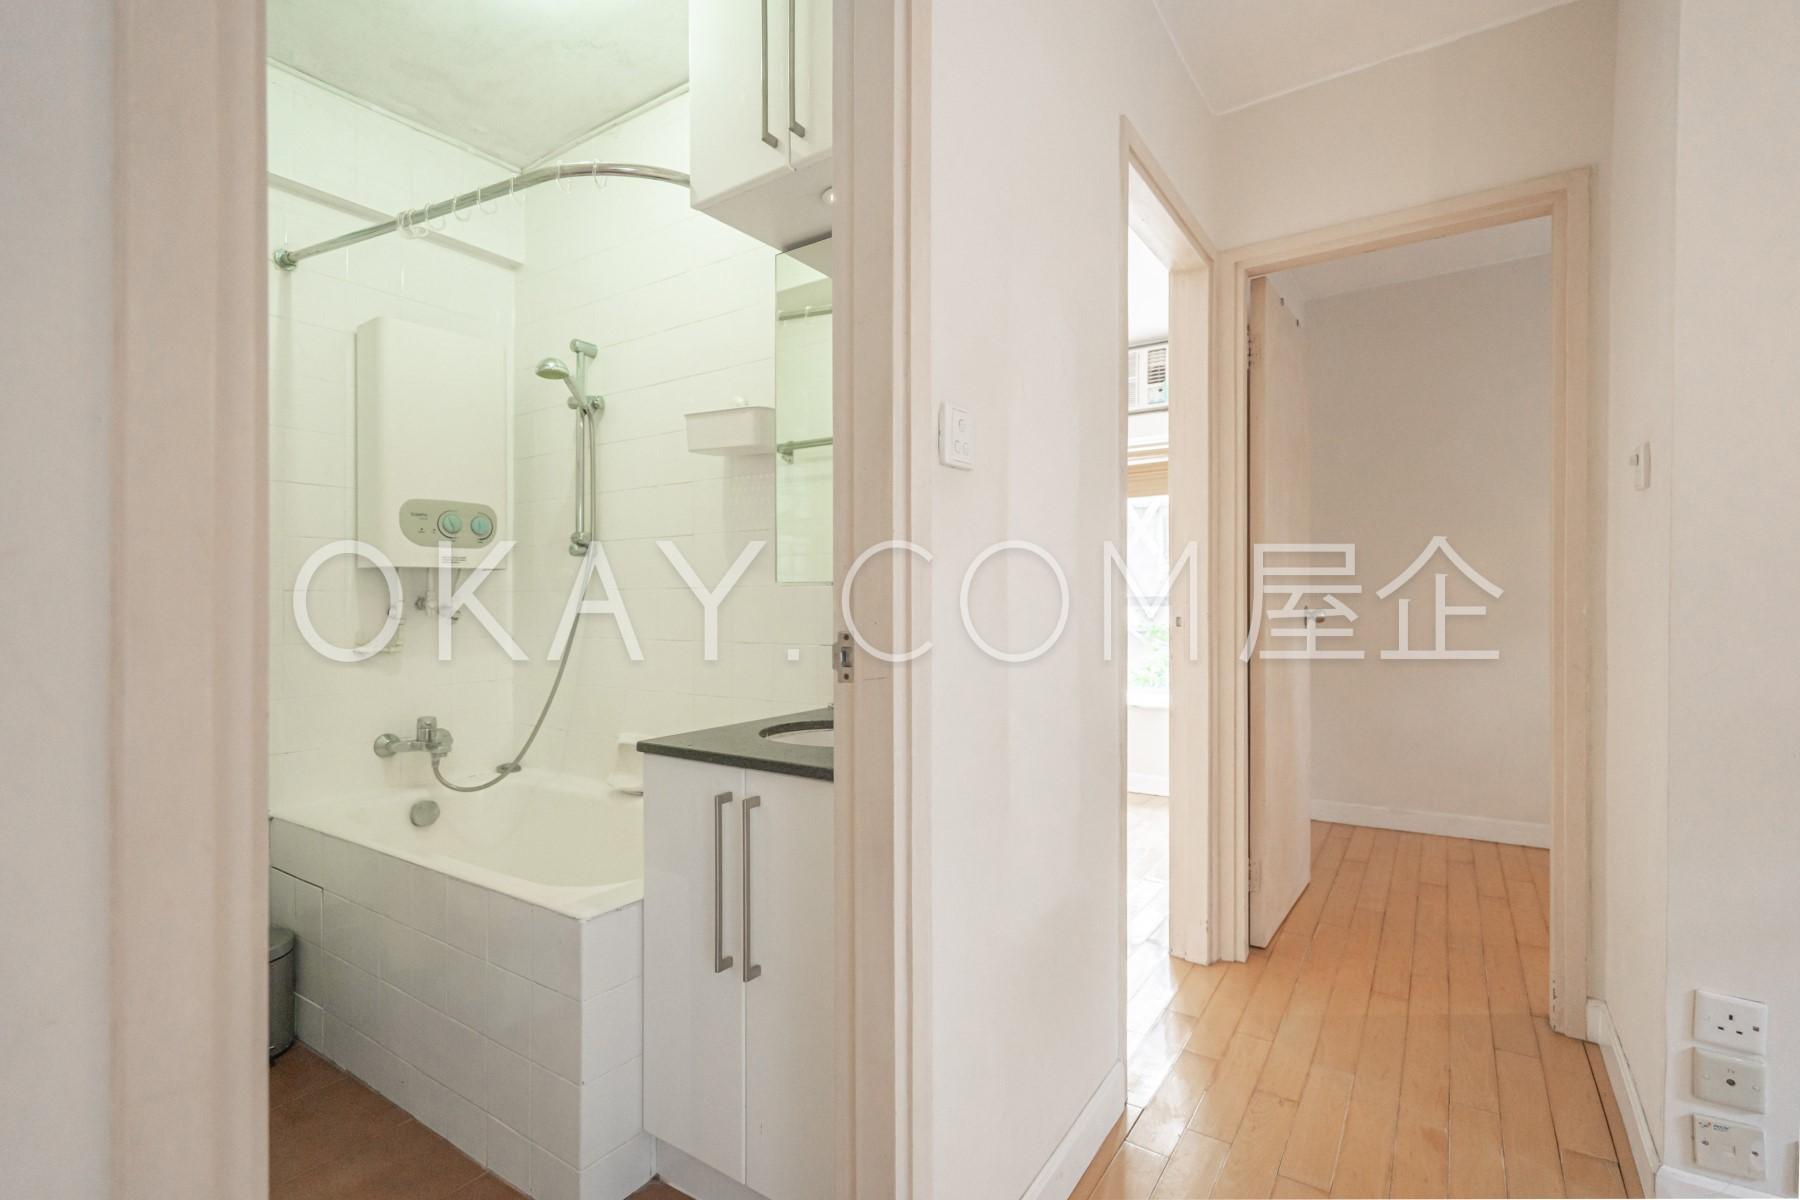 Corridor to Bathroom and Bedrooms